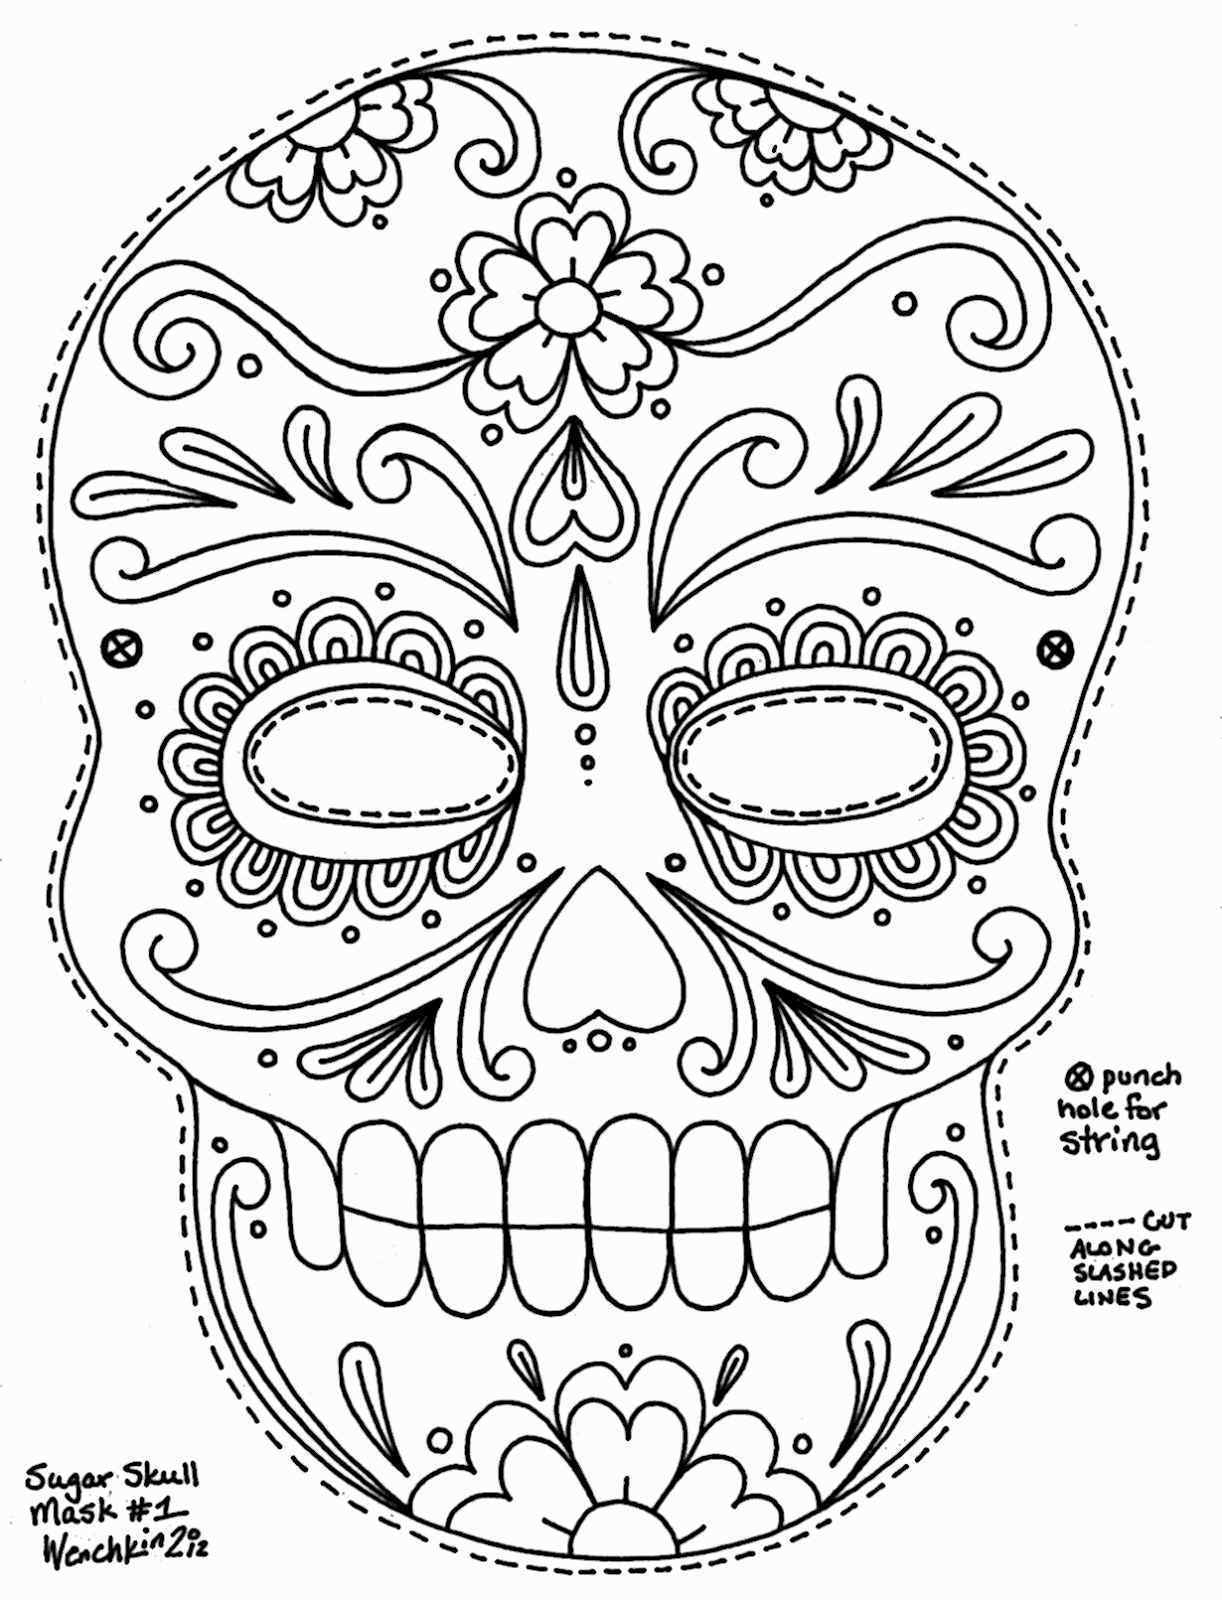 Spa Mask Invitation Template Inspirational Free Printable Character - Free Printable Hippo Mask